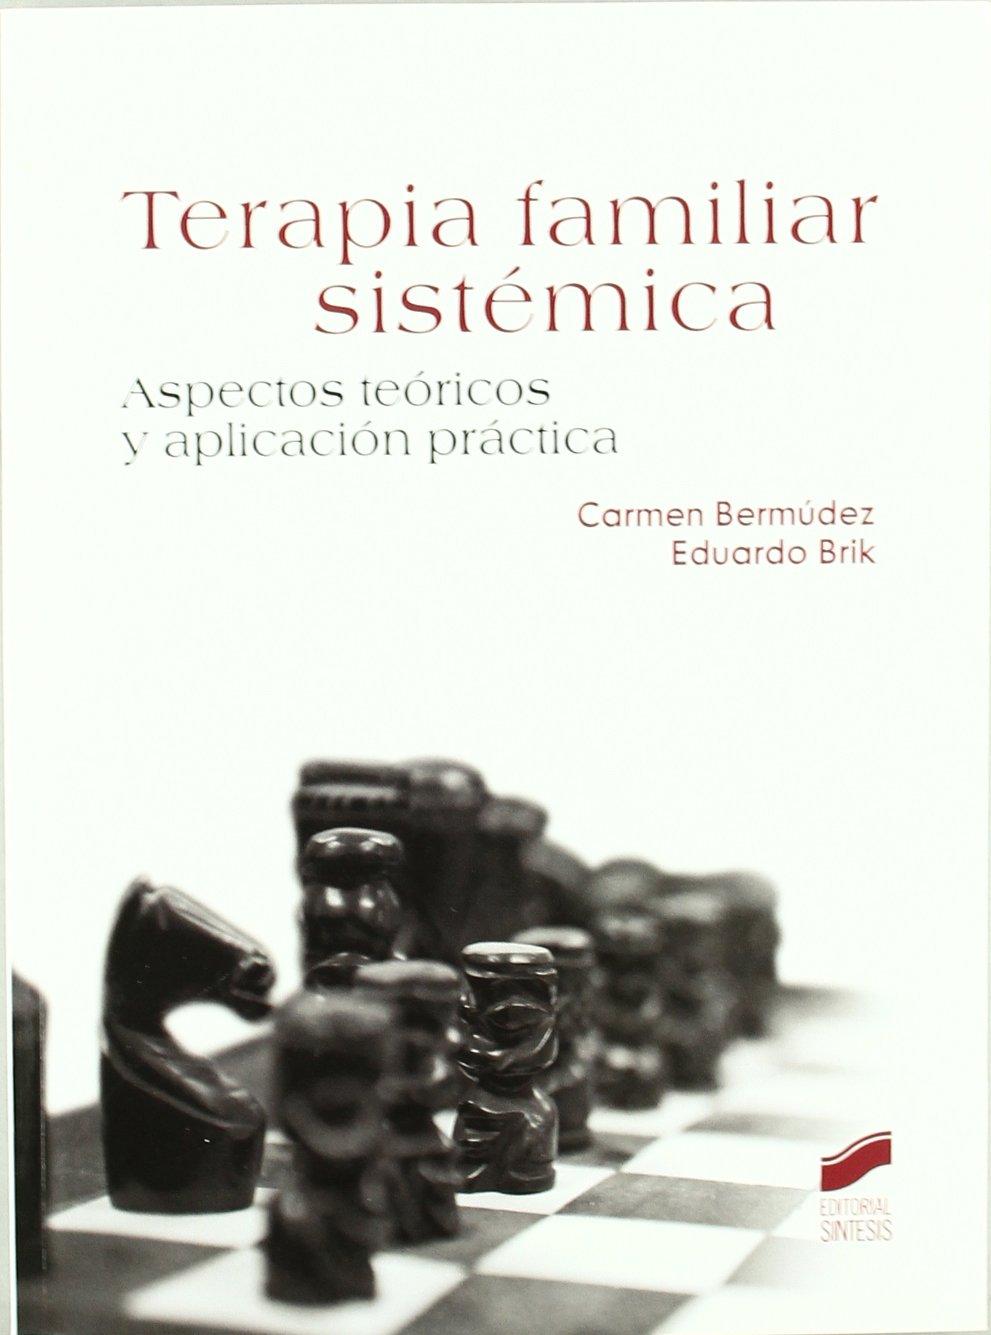 Terapia familiar sistémica: 12 Psicología. Manuales prácticos: Amazon.es: Bermúdez Romero, Carmen, Brik Galicer, Eduardo Héctor: Libros